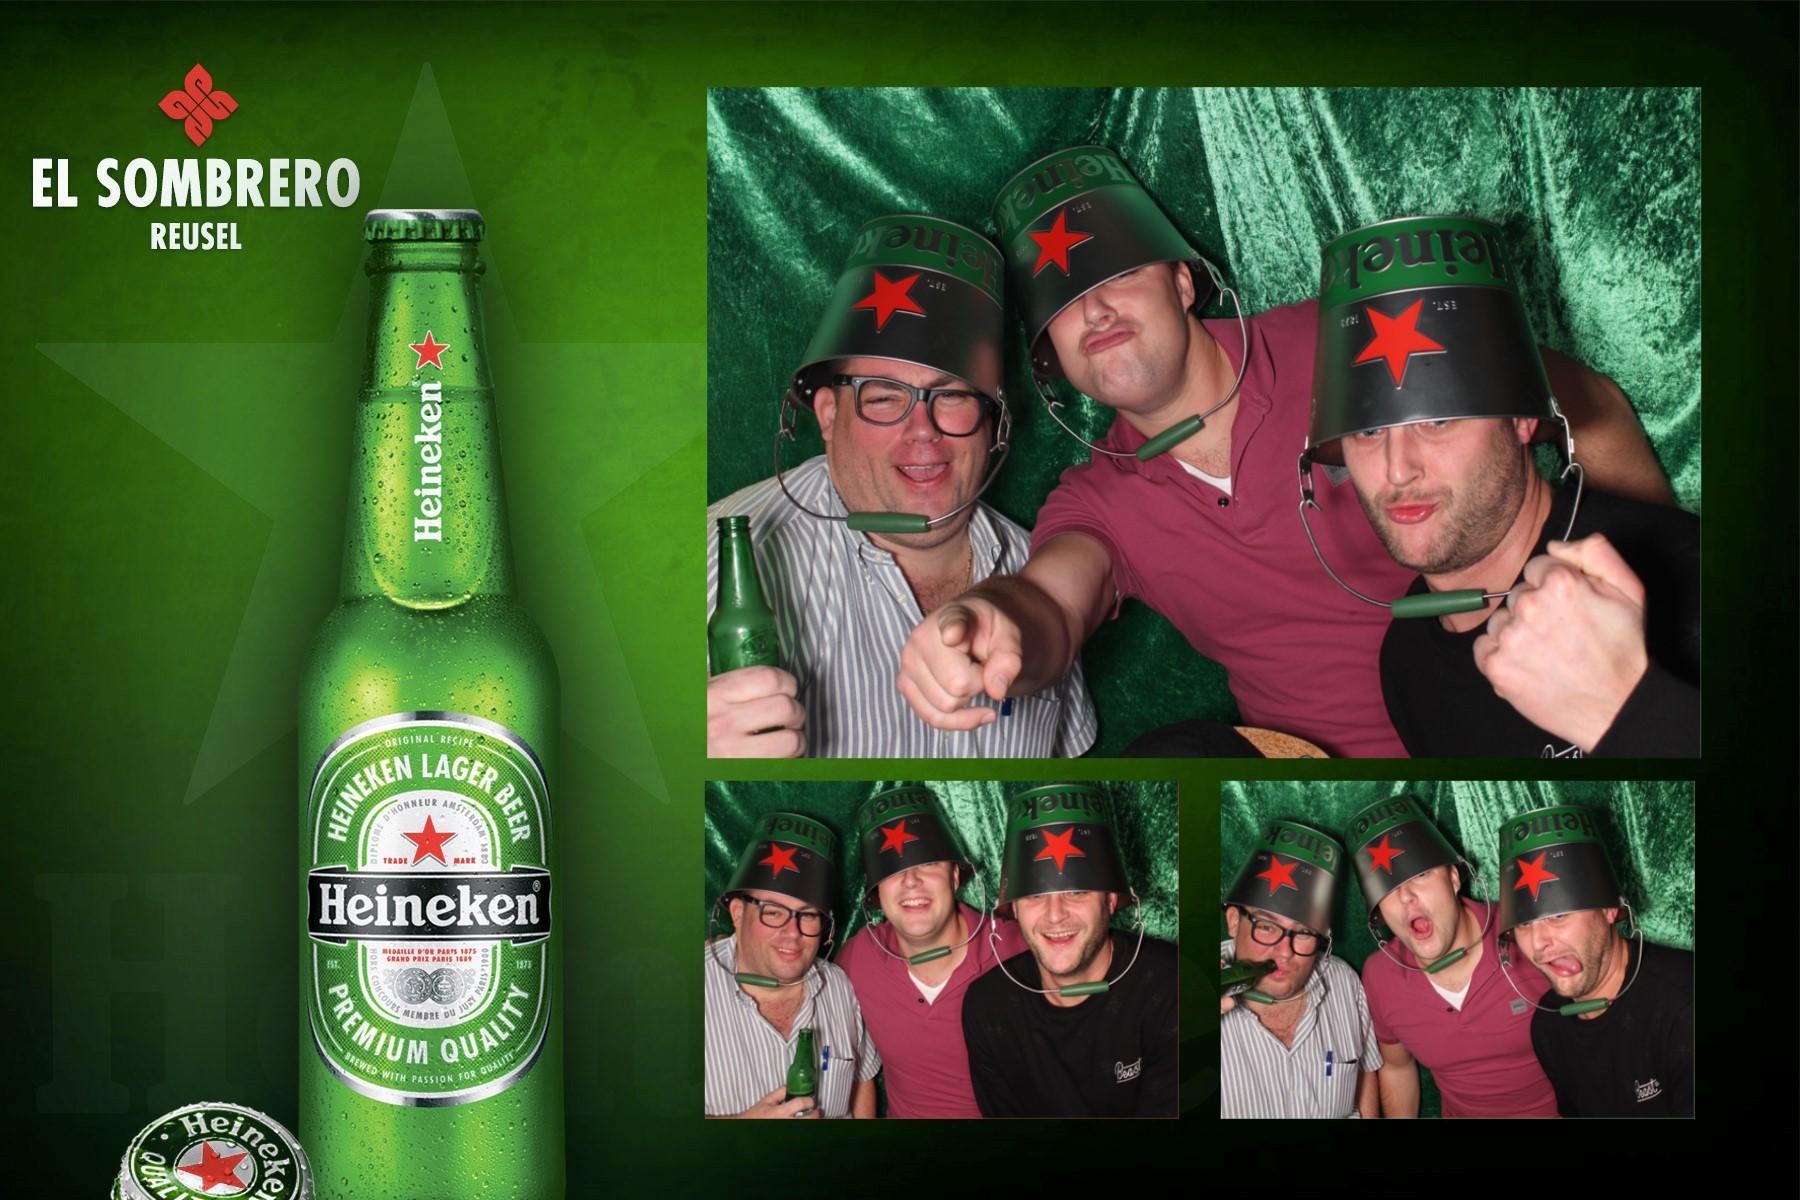 Heineken fotobooth